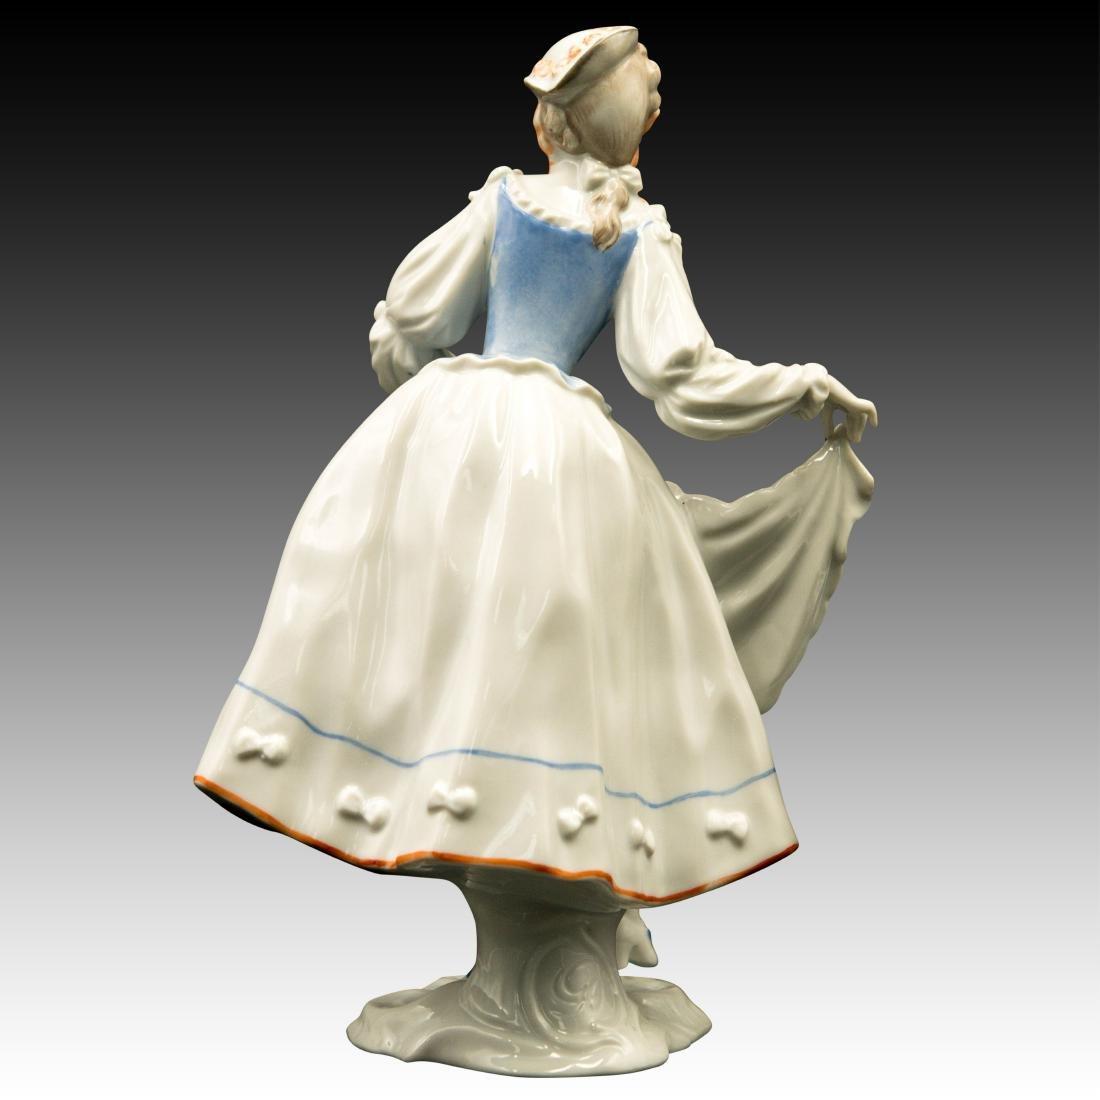 Rosenthal Rococo Lady Dancer Figurine - 3